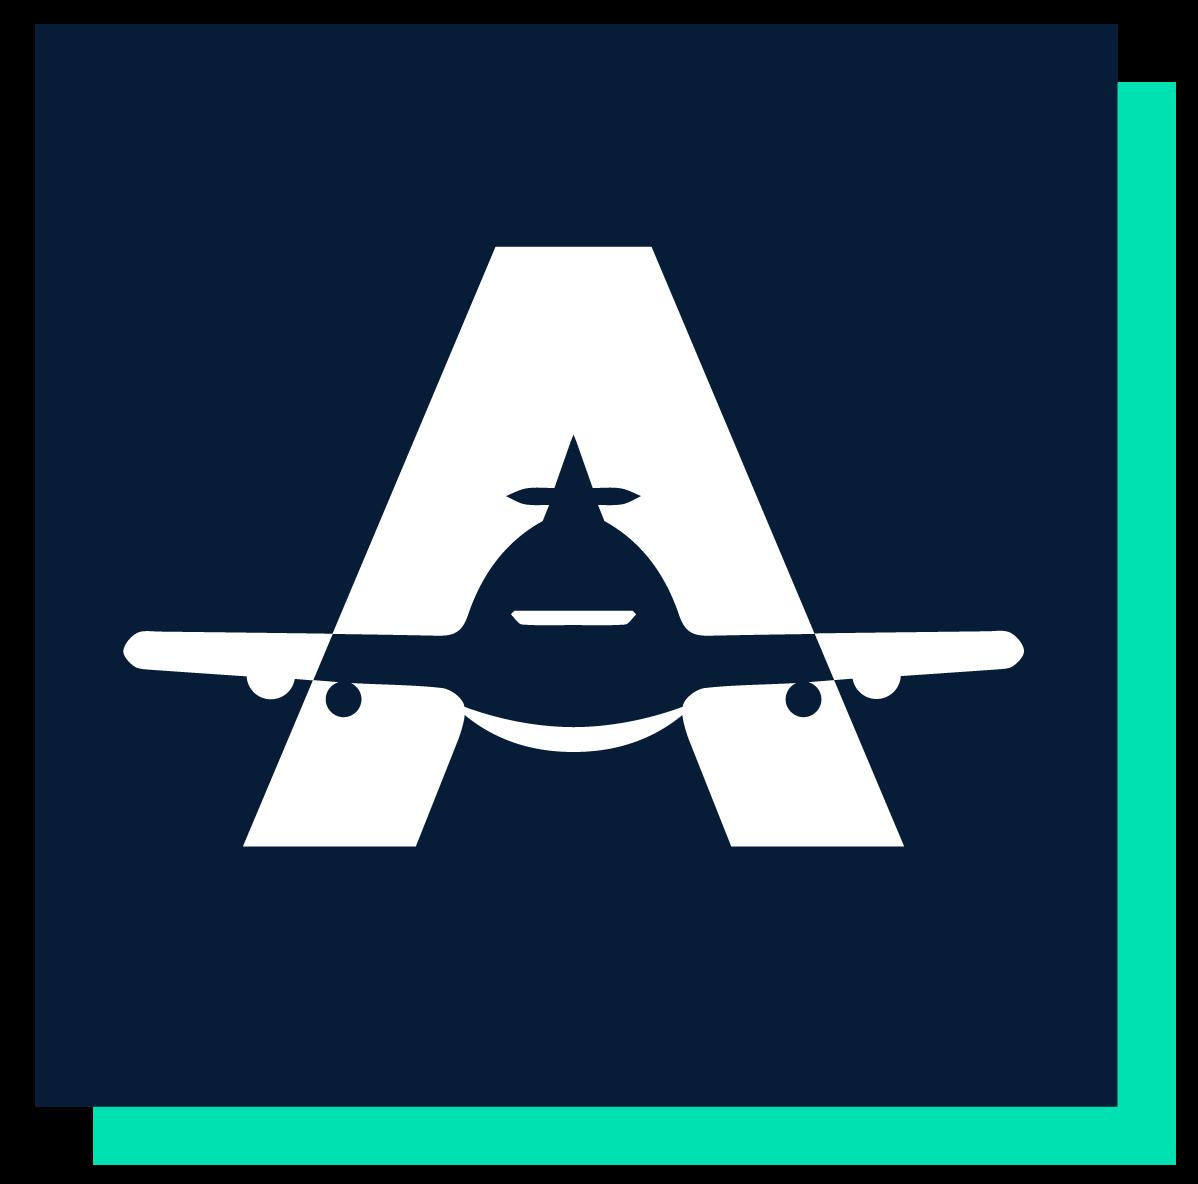 Hangar A air cargo digital platform logo